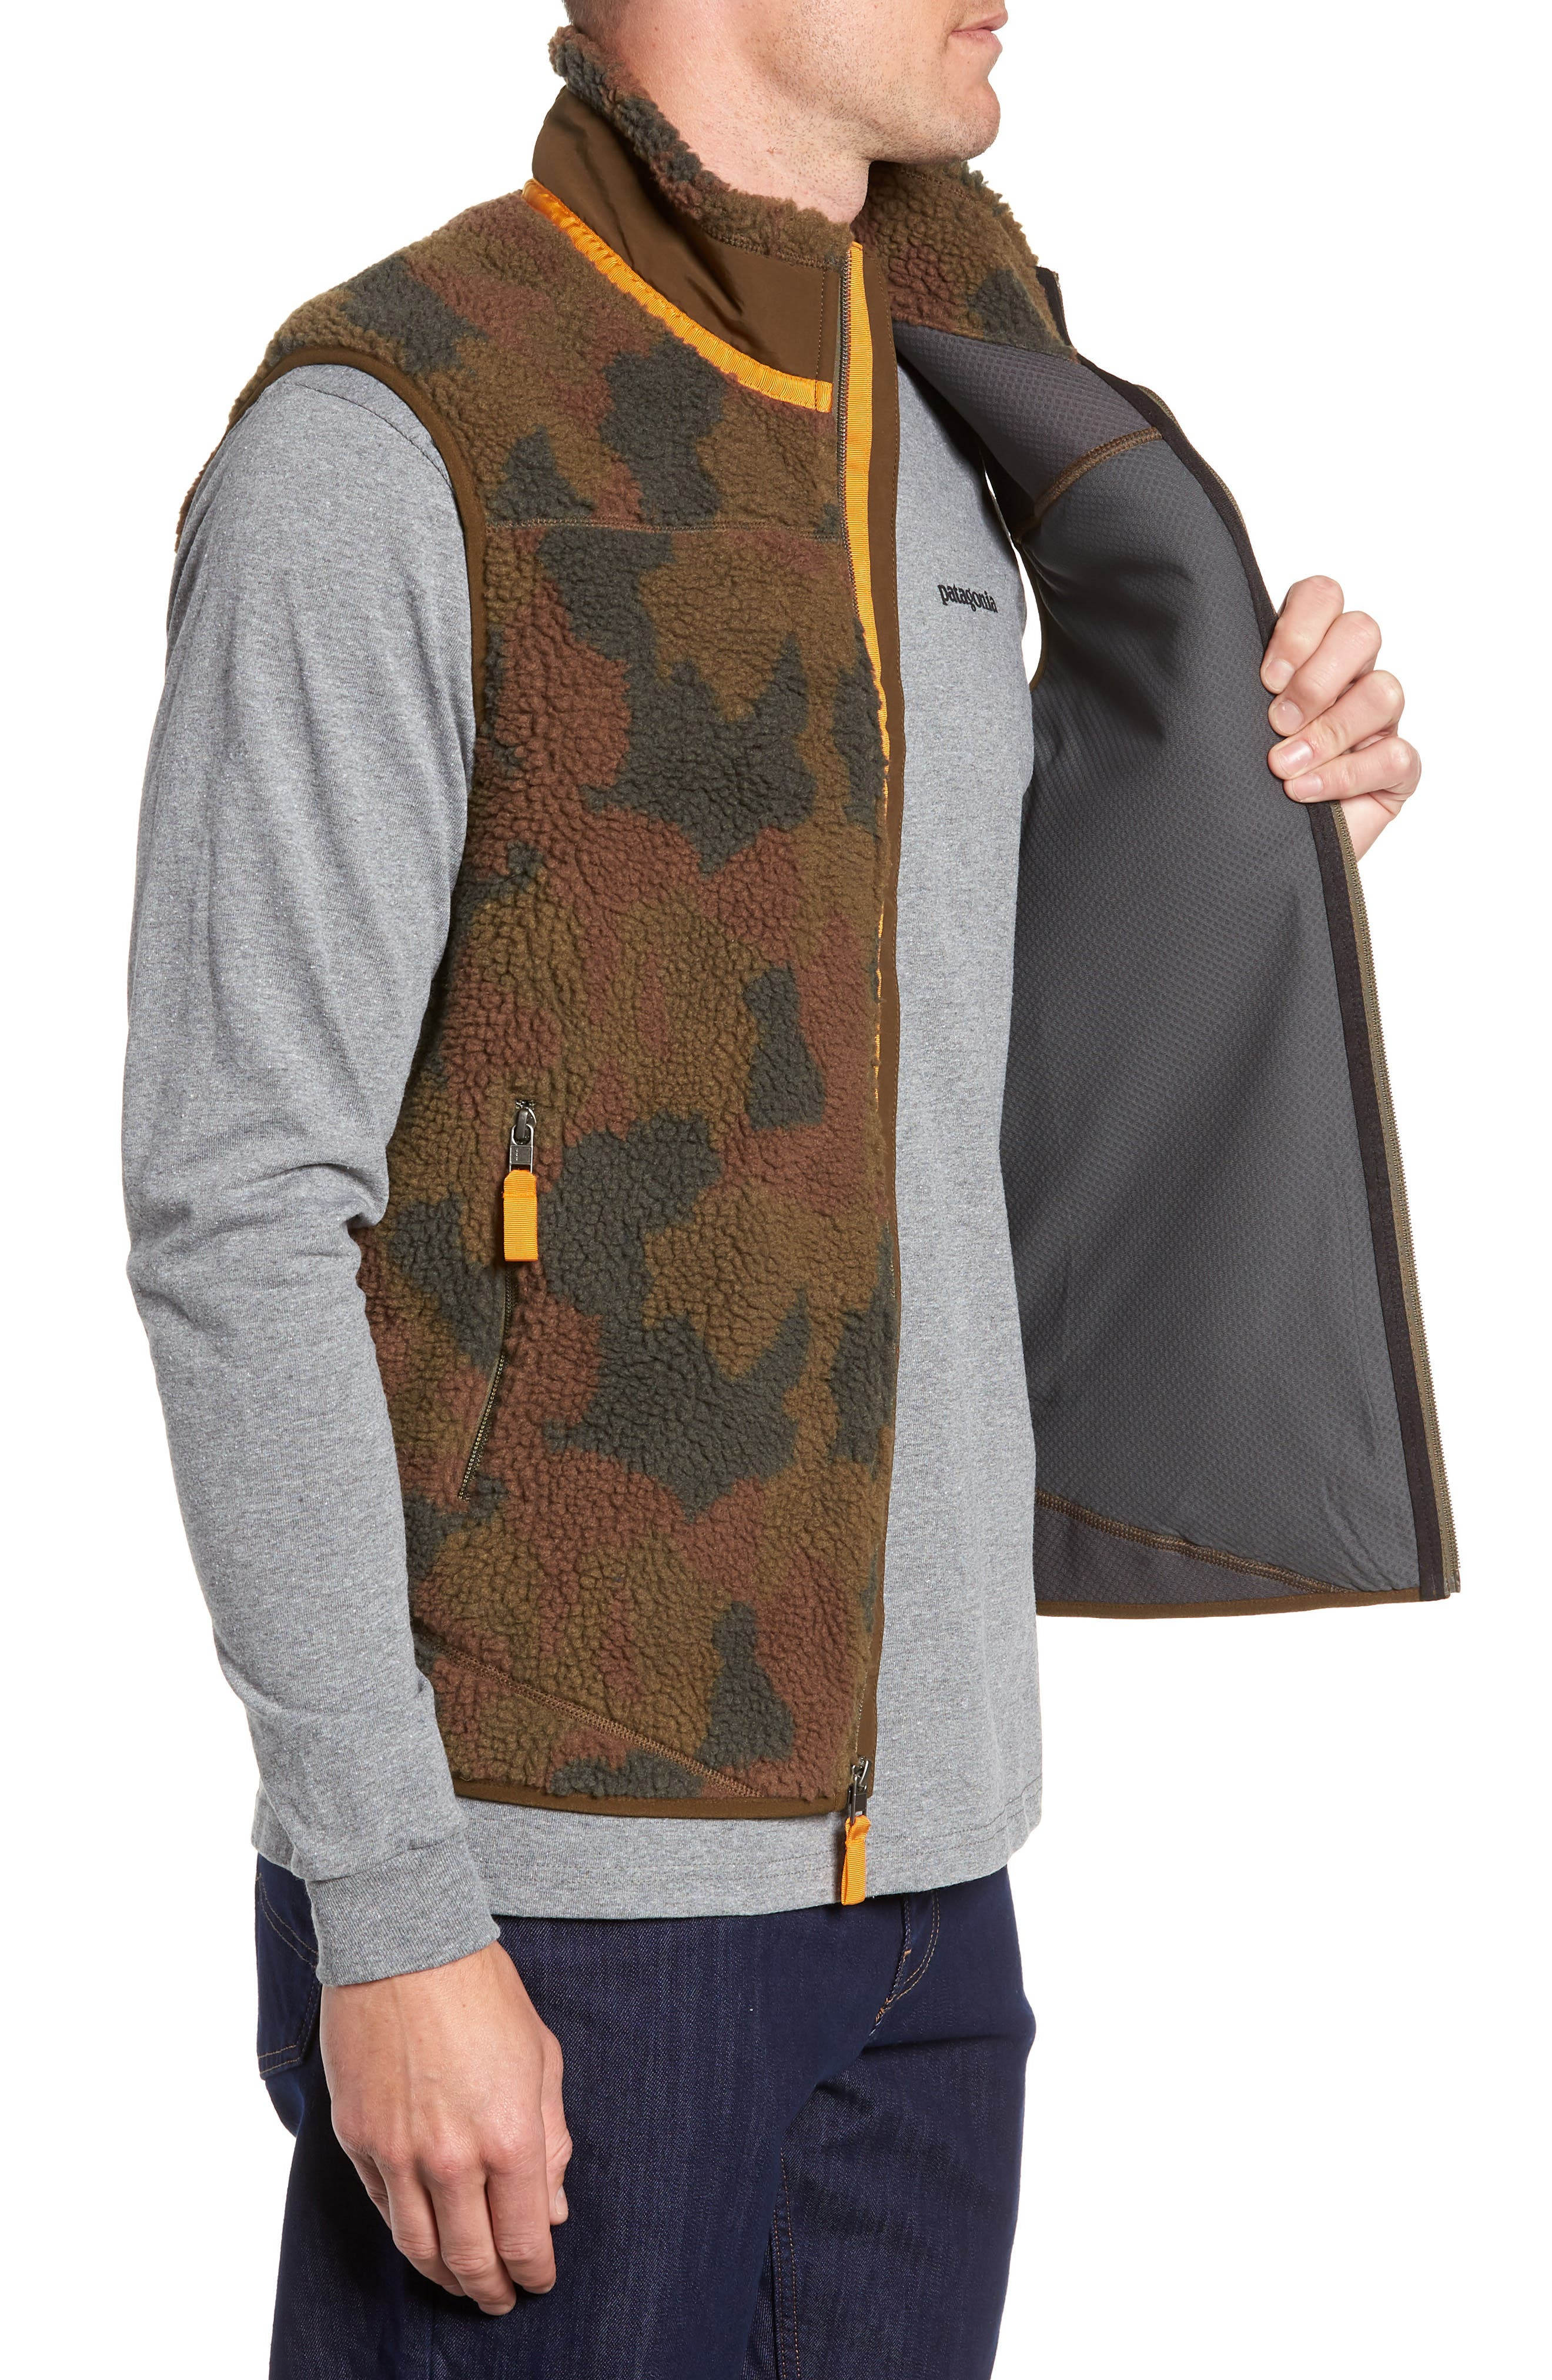 Classic Retro-X<sup>®</sup> Windproof Vest,                             Alternate thumbnail 3, color,                             BUNKER CAMO CARGO GREEN